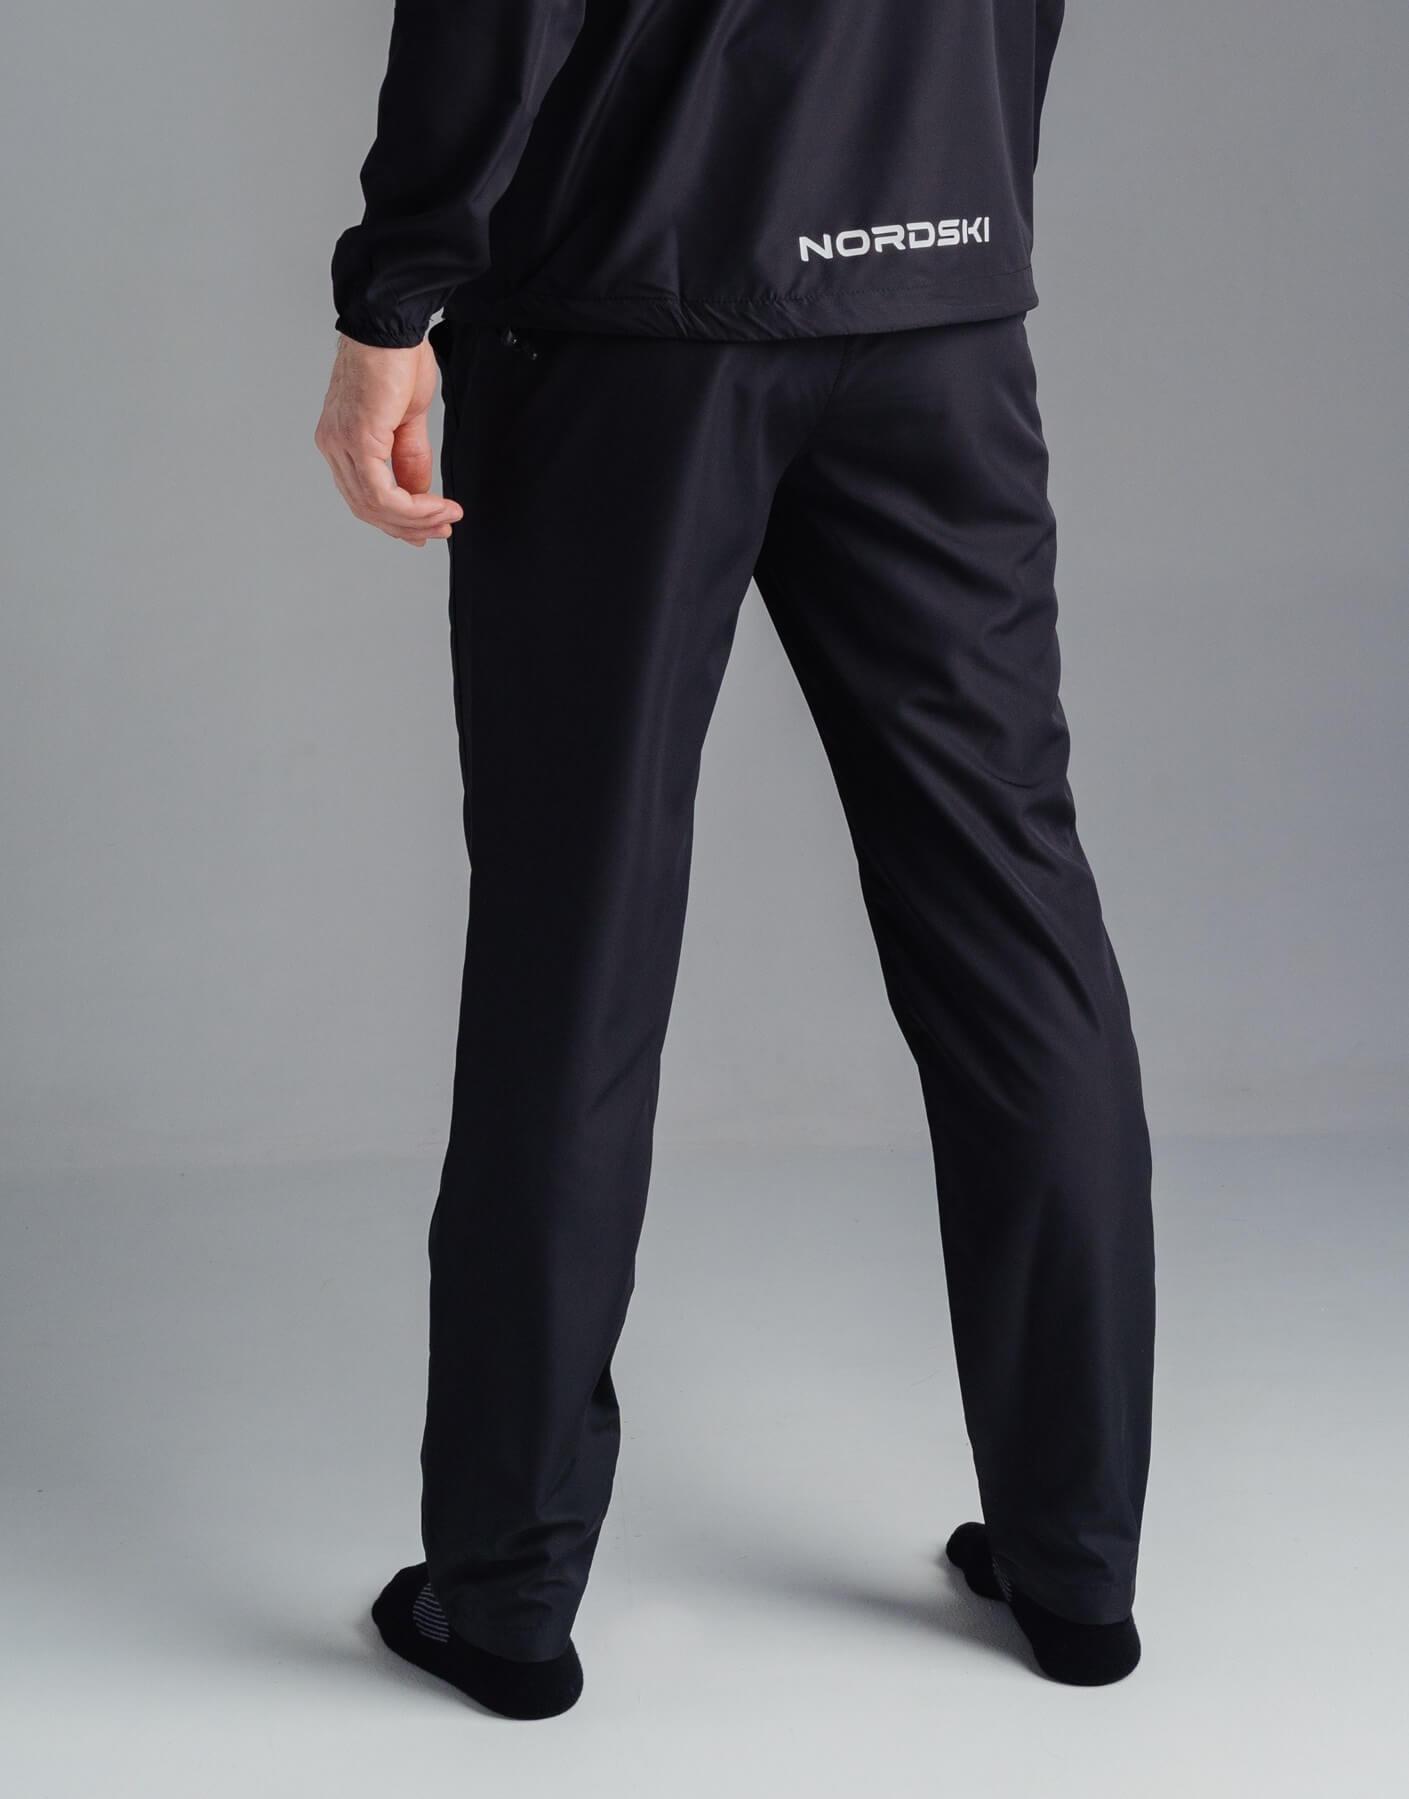 Nordski Motion брюки мужские Black - 2